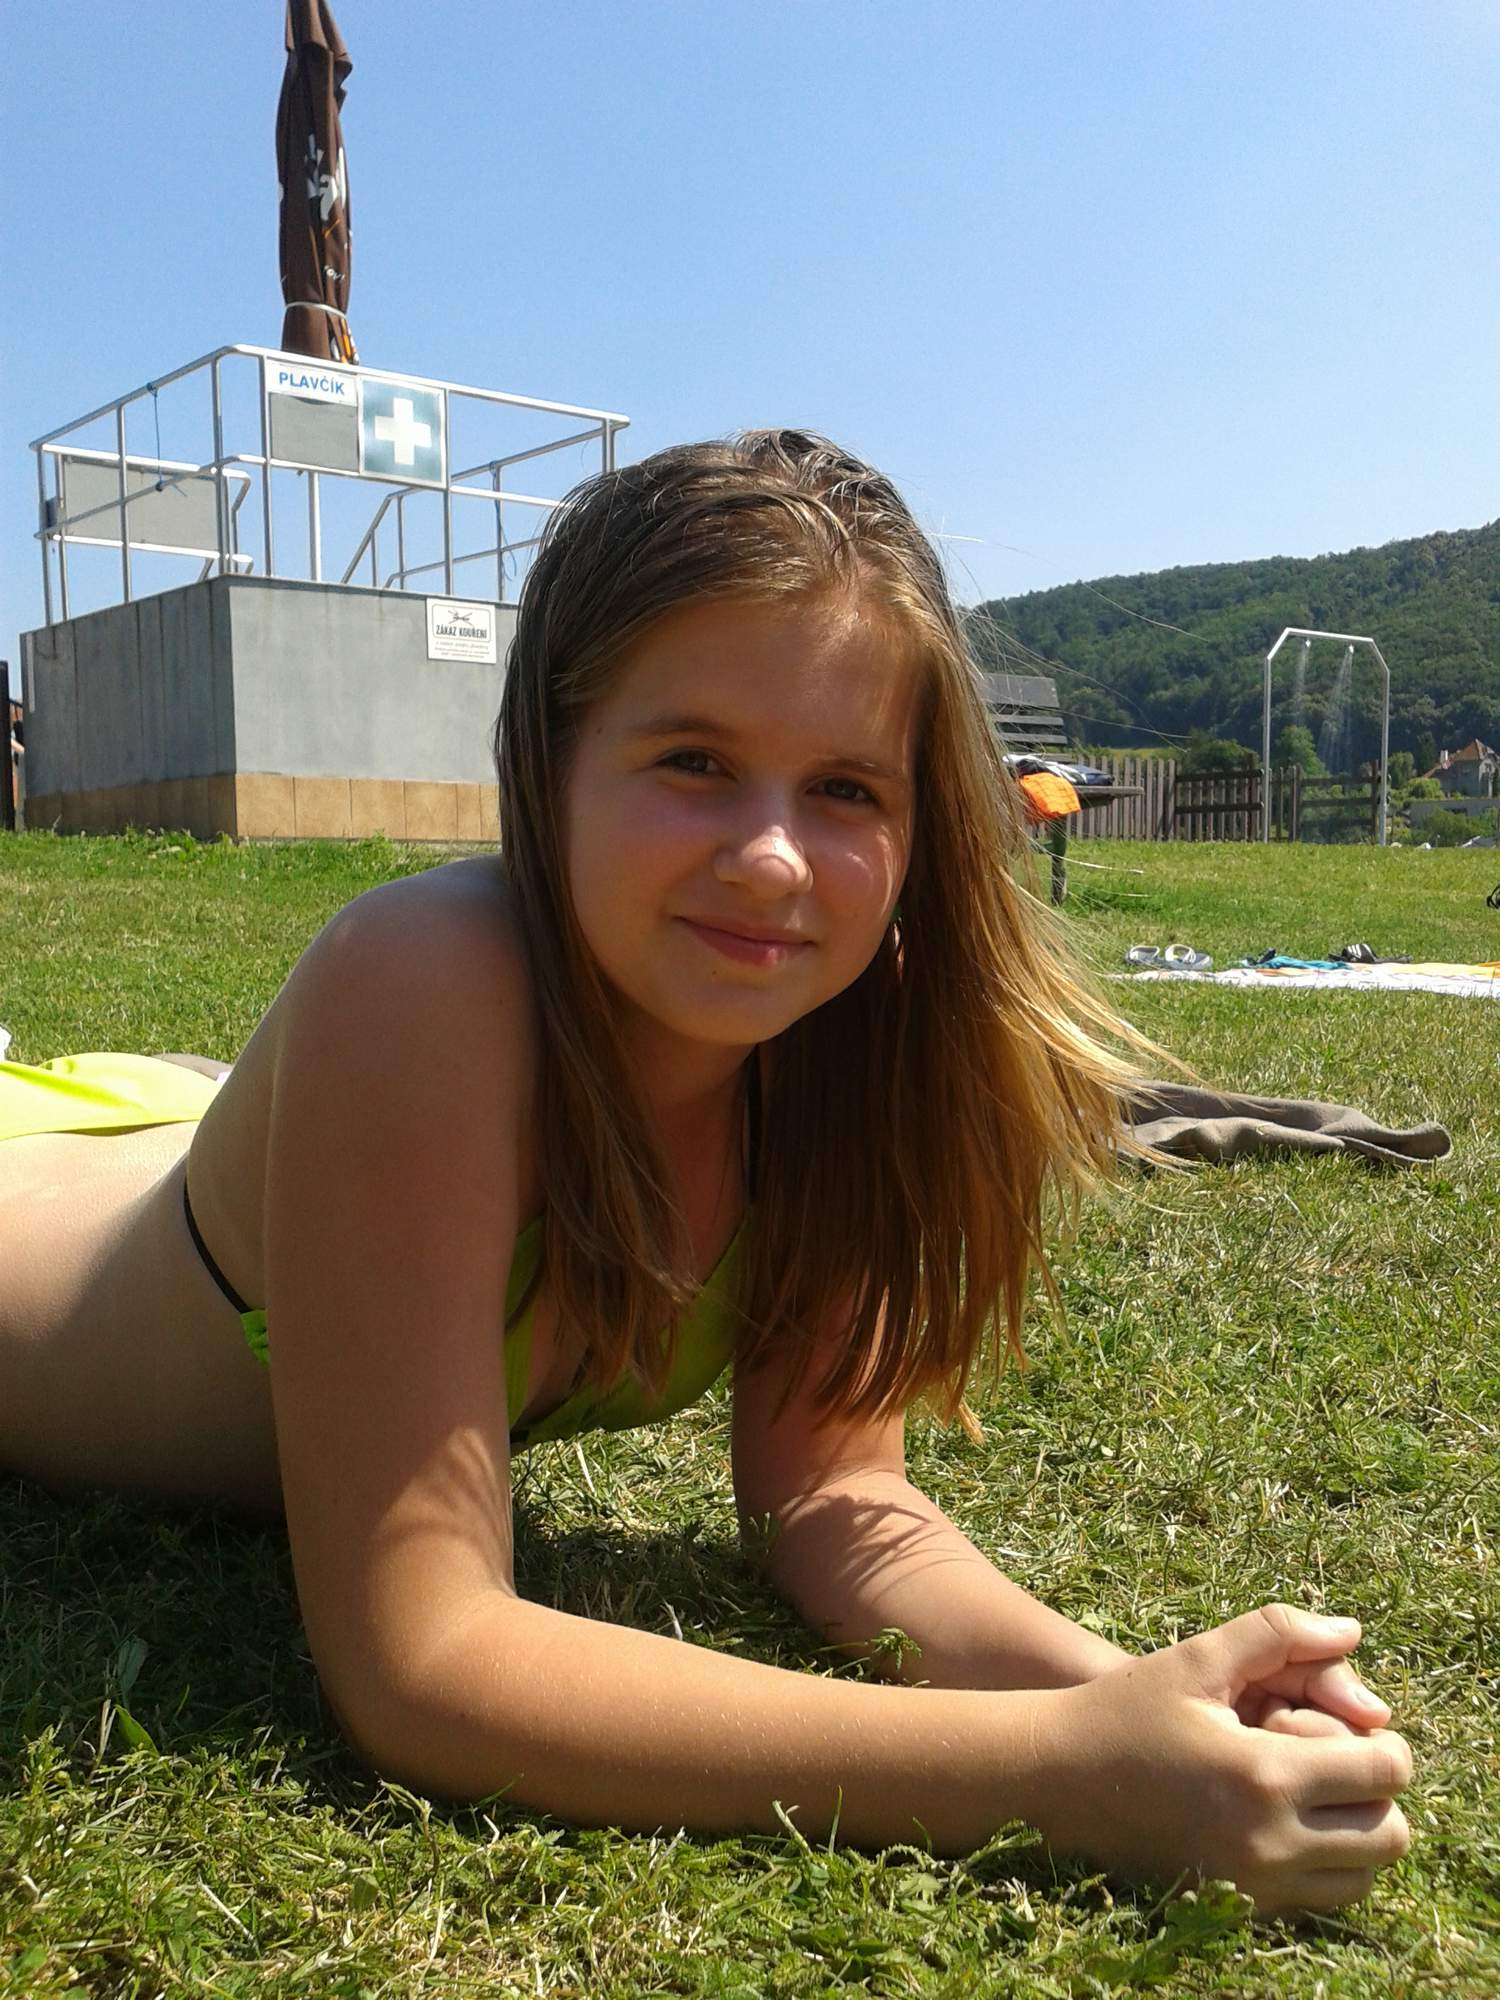 Boy Pipi Images Usseek Com Nude Picture | BLueDols